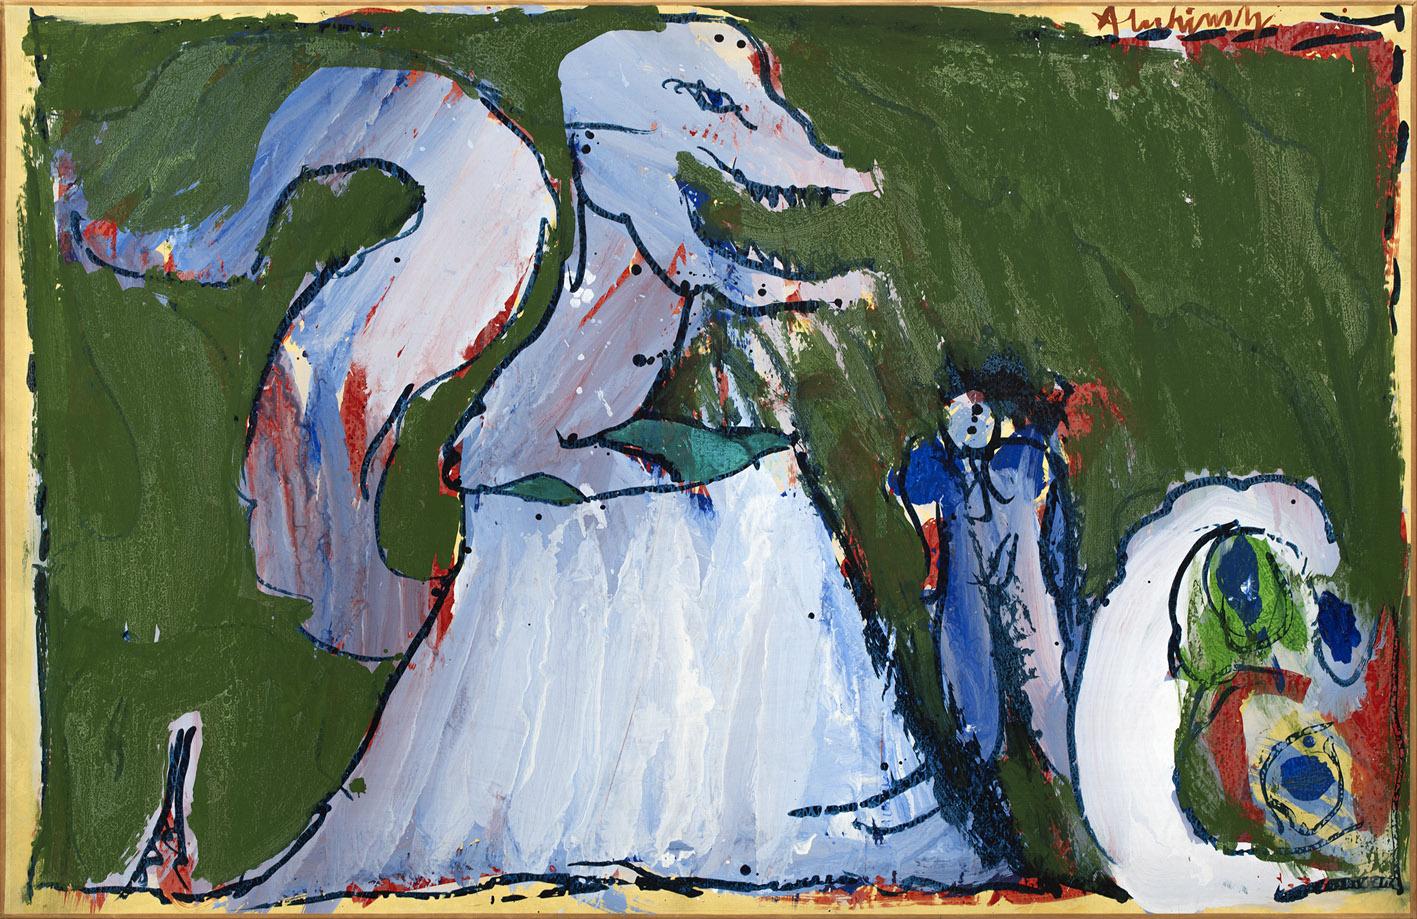 Pierre Alechinsky - Artiste - Galerie Lelong & Co. concernant Oeuvre Alechinsky